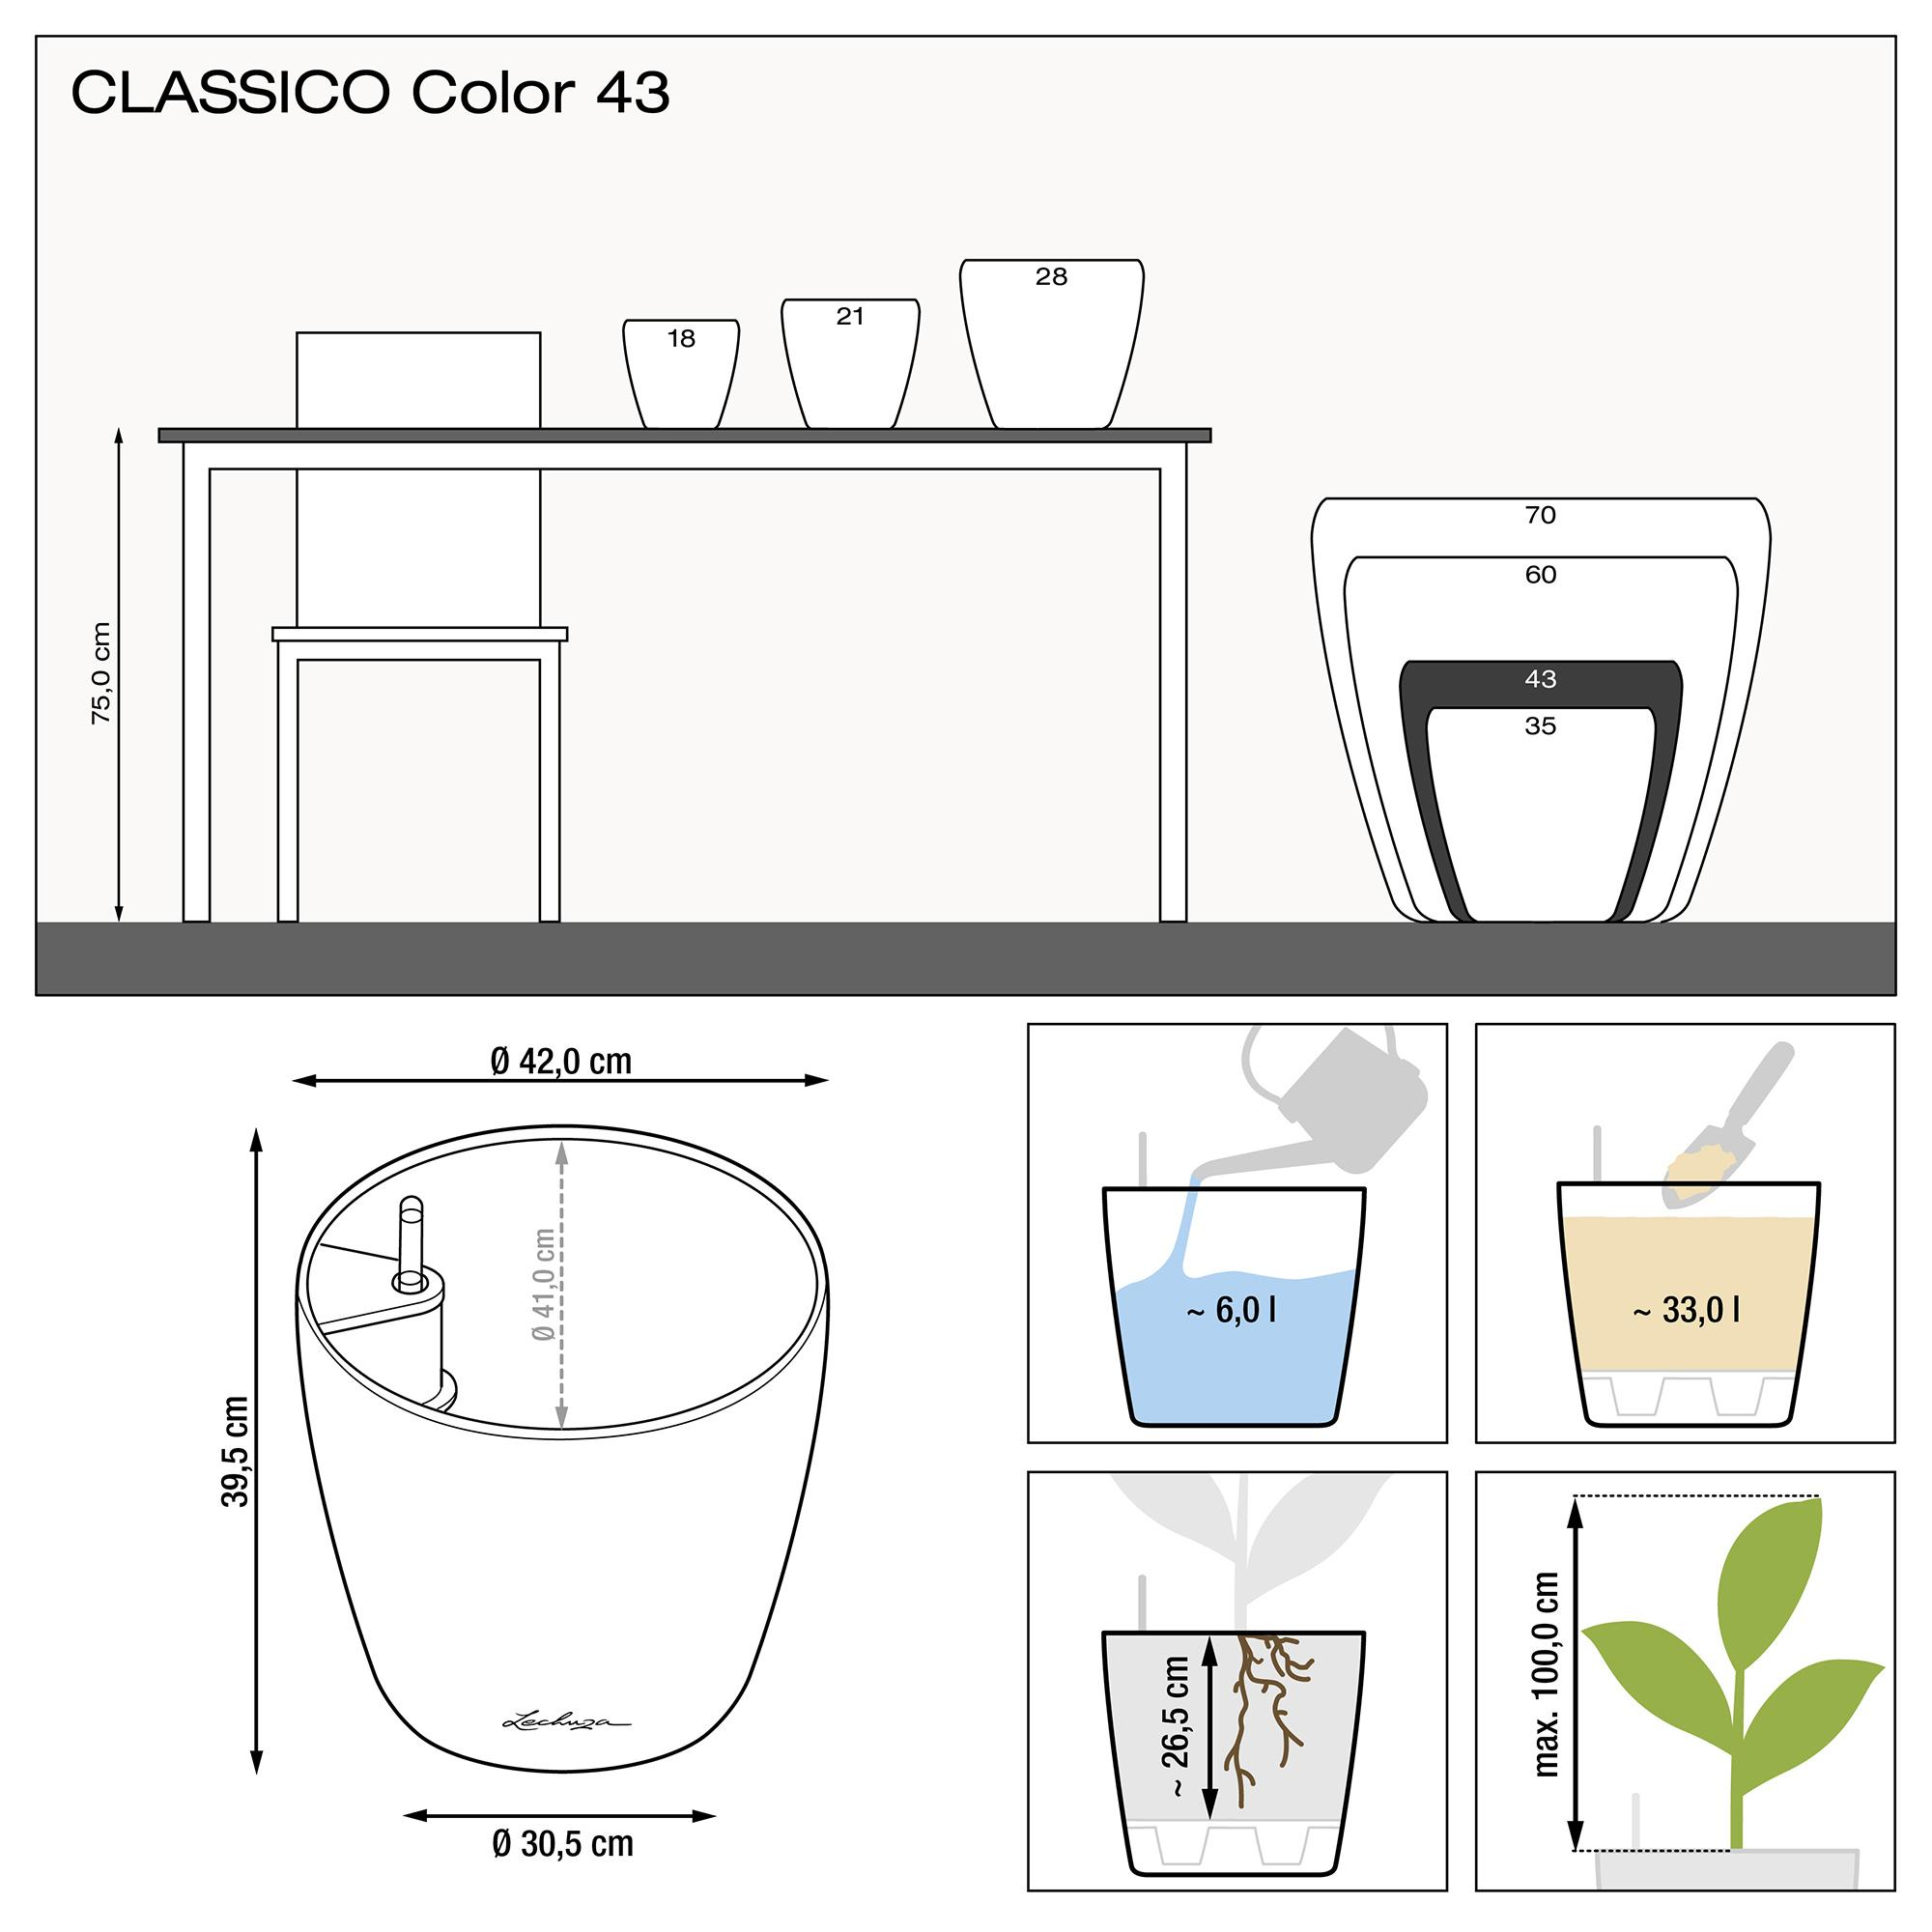 CLASSICO Color 43 weiß - Bild 2